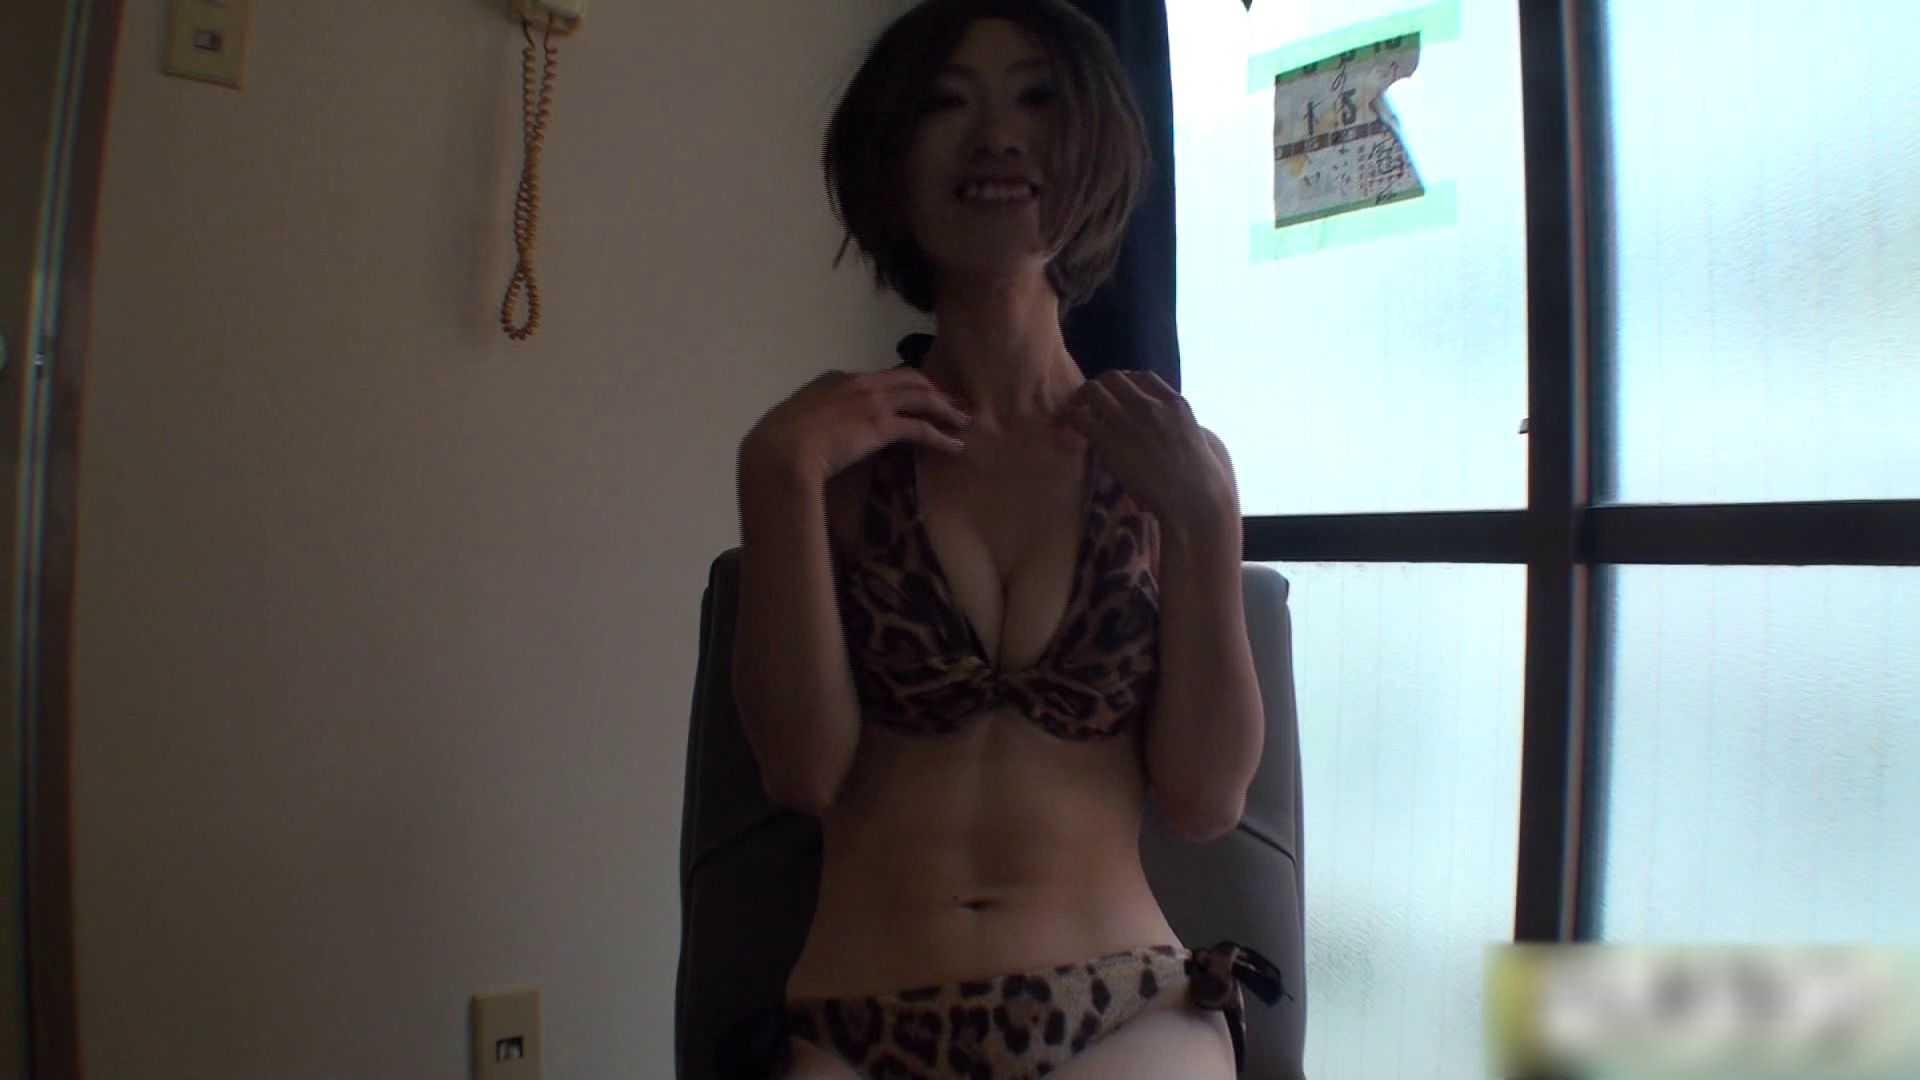 S級厳選美女ビッチガールVol.46 美しいOLの裸体 セックス無修正動画無料 89pic 2